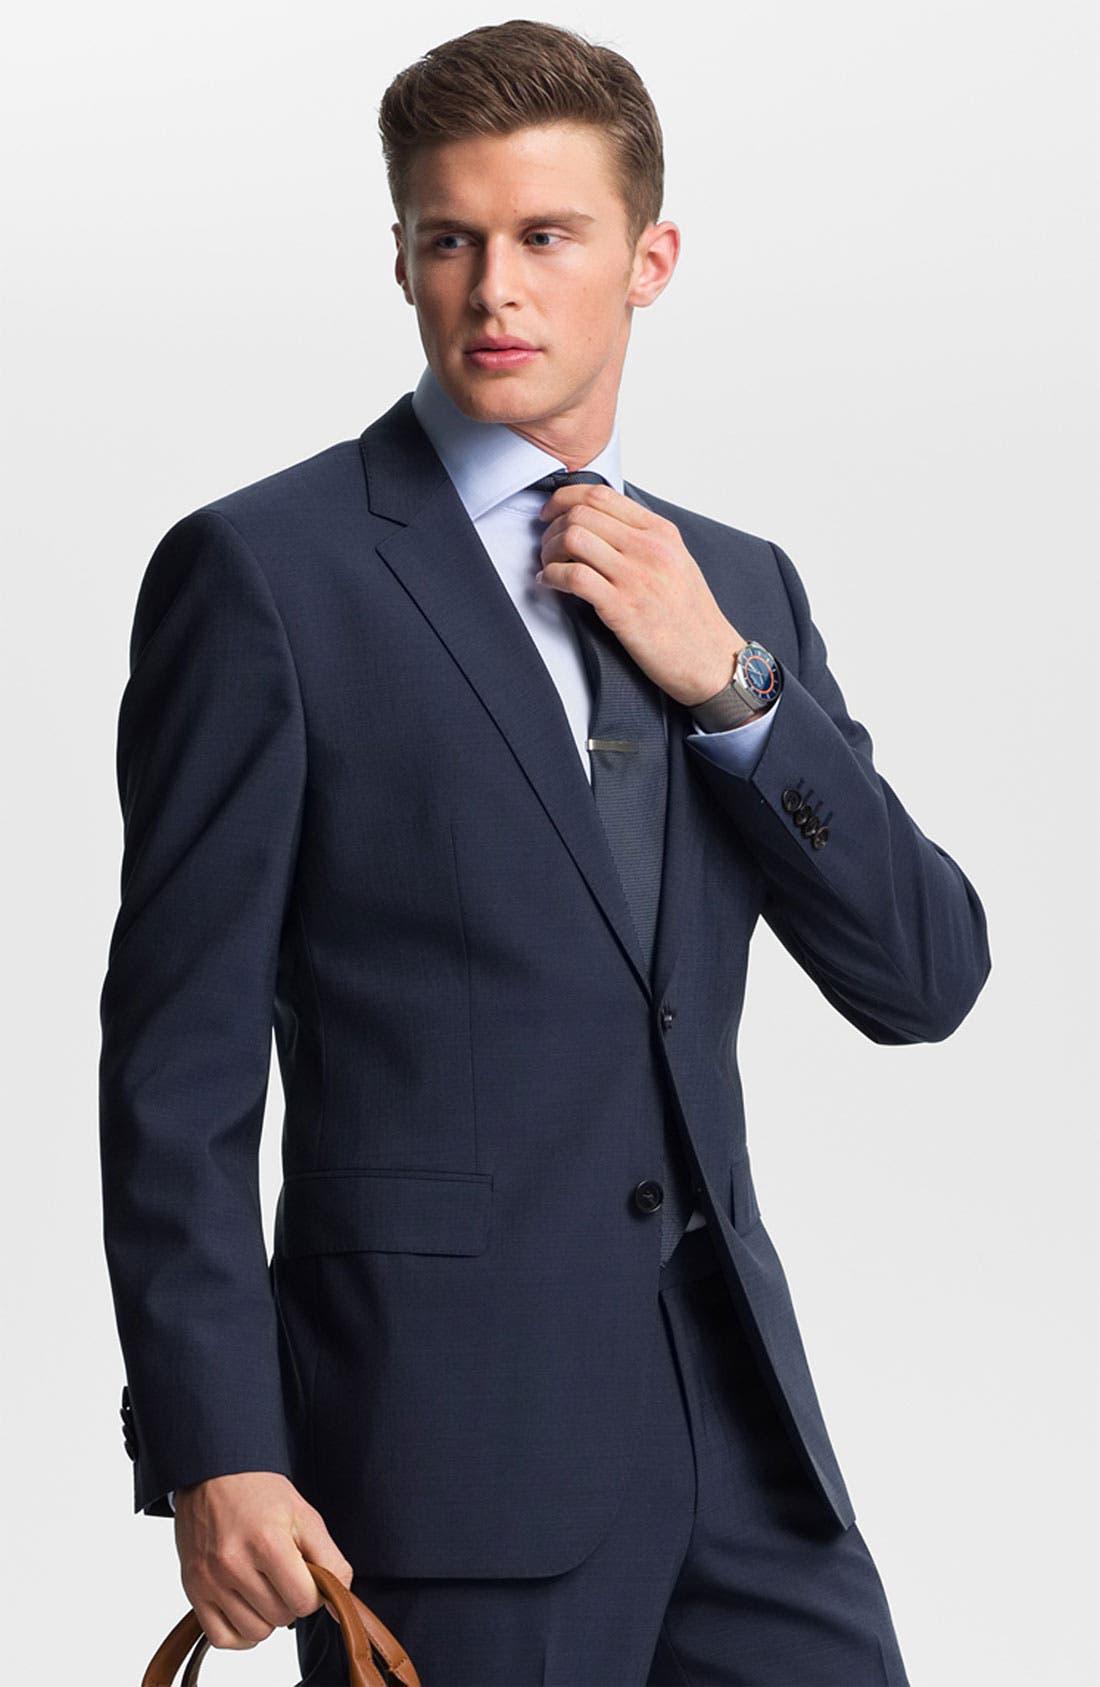 Alternate Image 1 Selected - BOSS Black 'James/Sharp' Trim Fit Suit